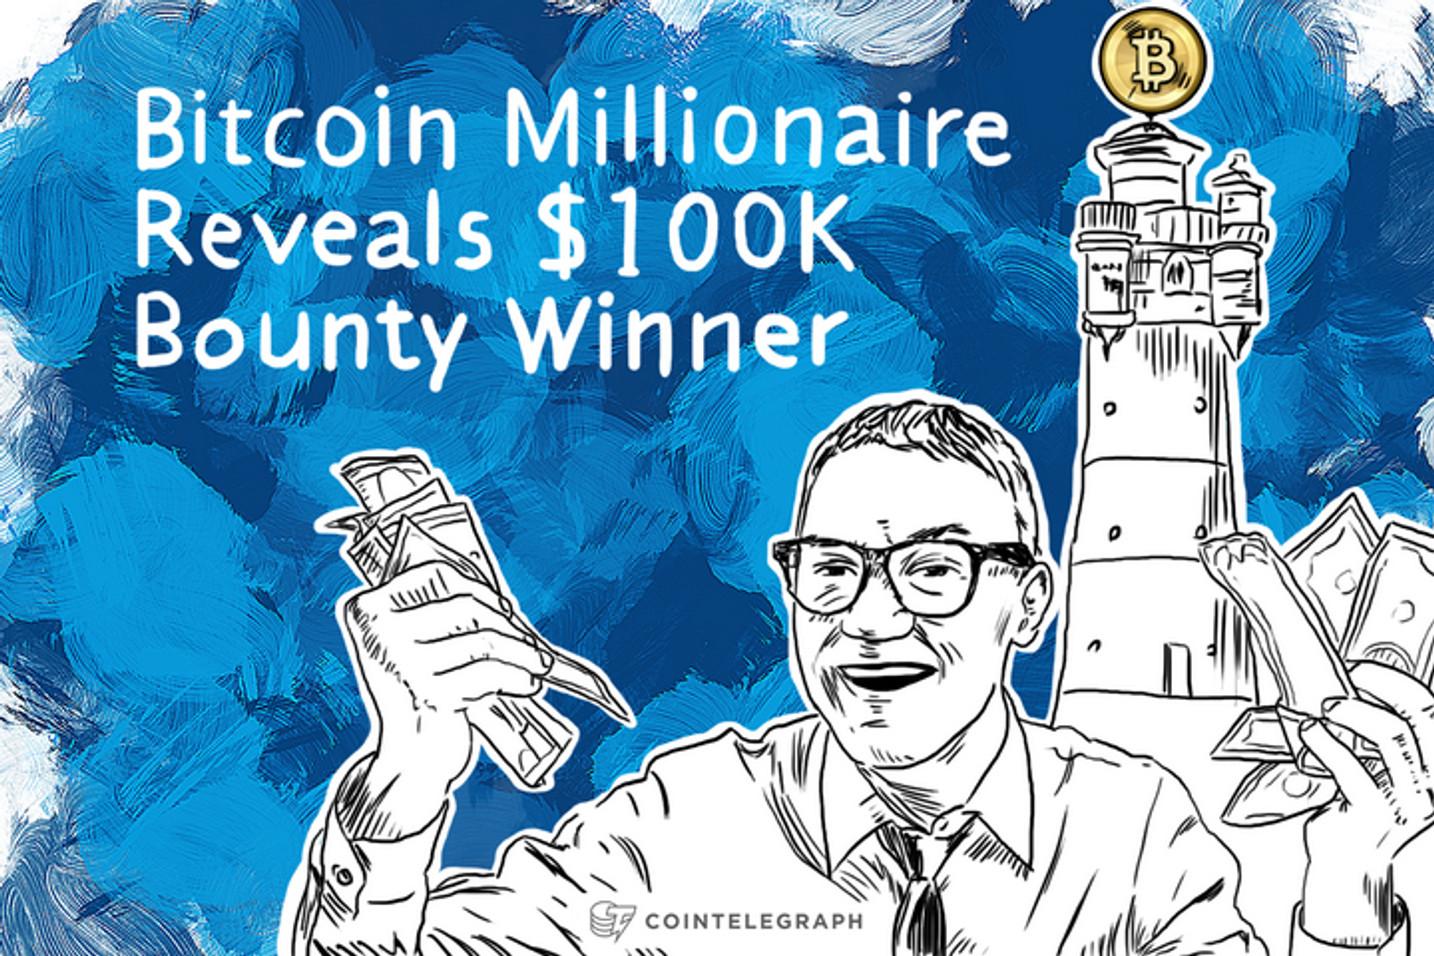 Bitcoin Millionaire Reveals $100K Bounty Winner